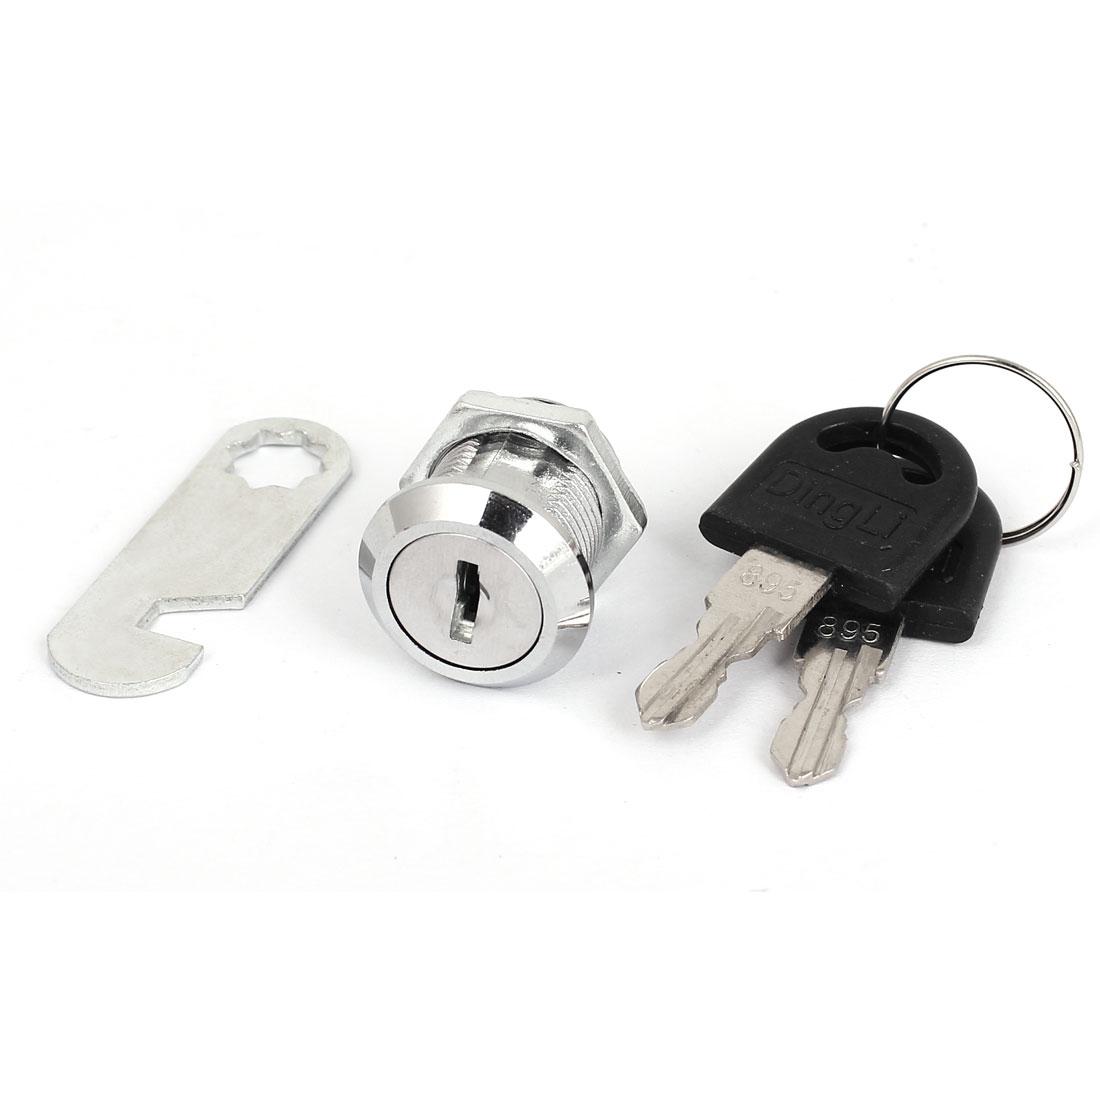 File Cabinet Shop Mailbox Drawer Cupboard Security Cam Chest Lock Camlock w 2 Keys